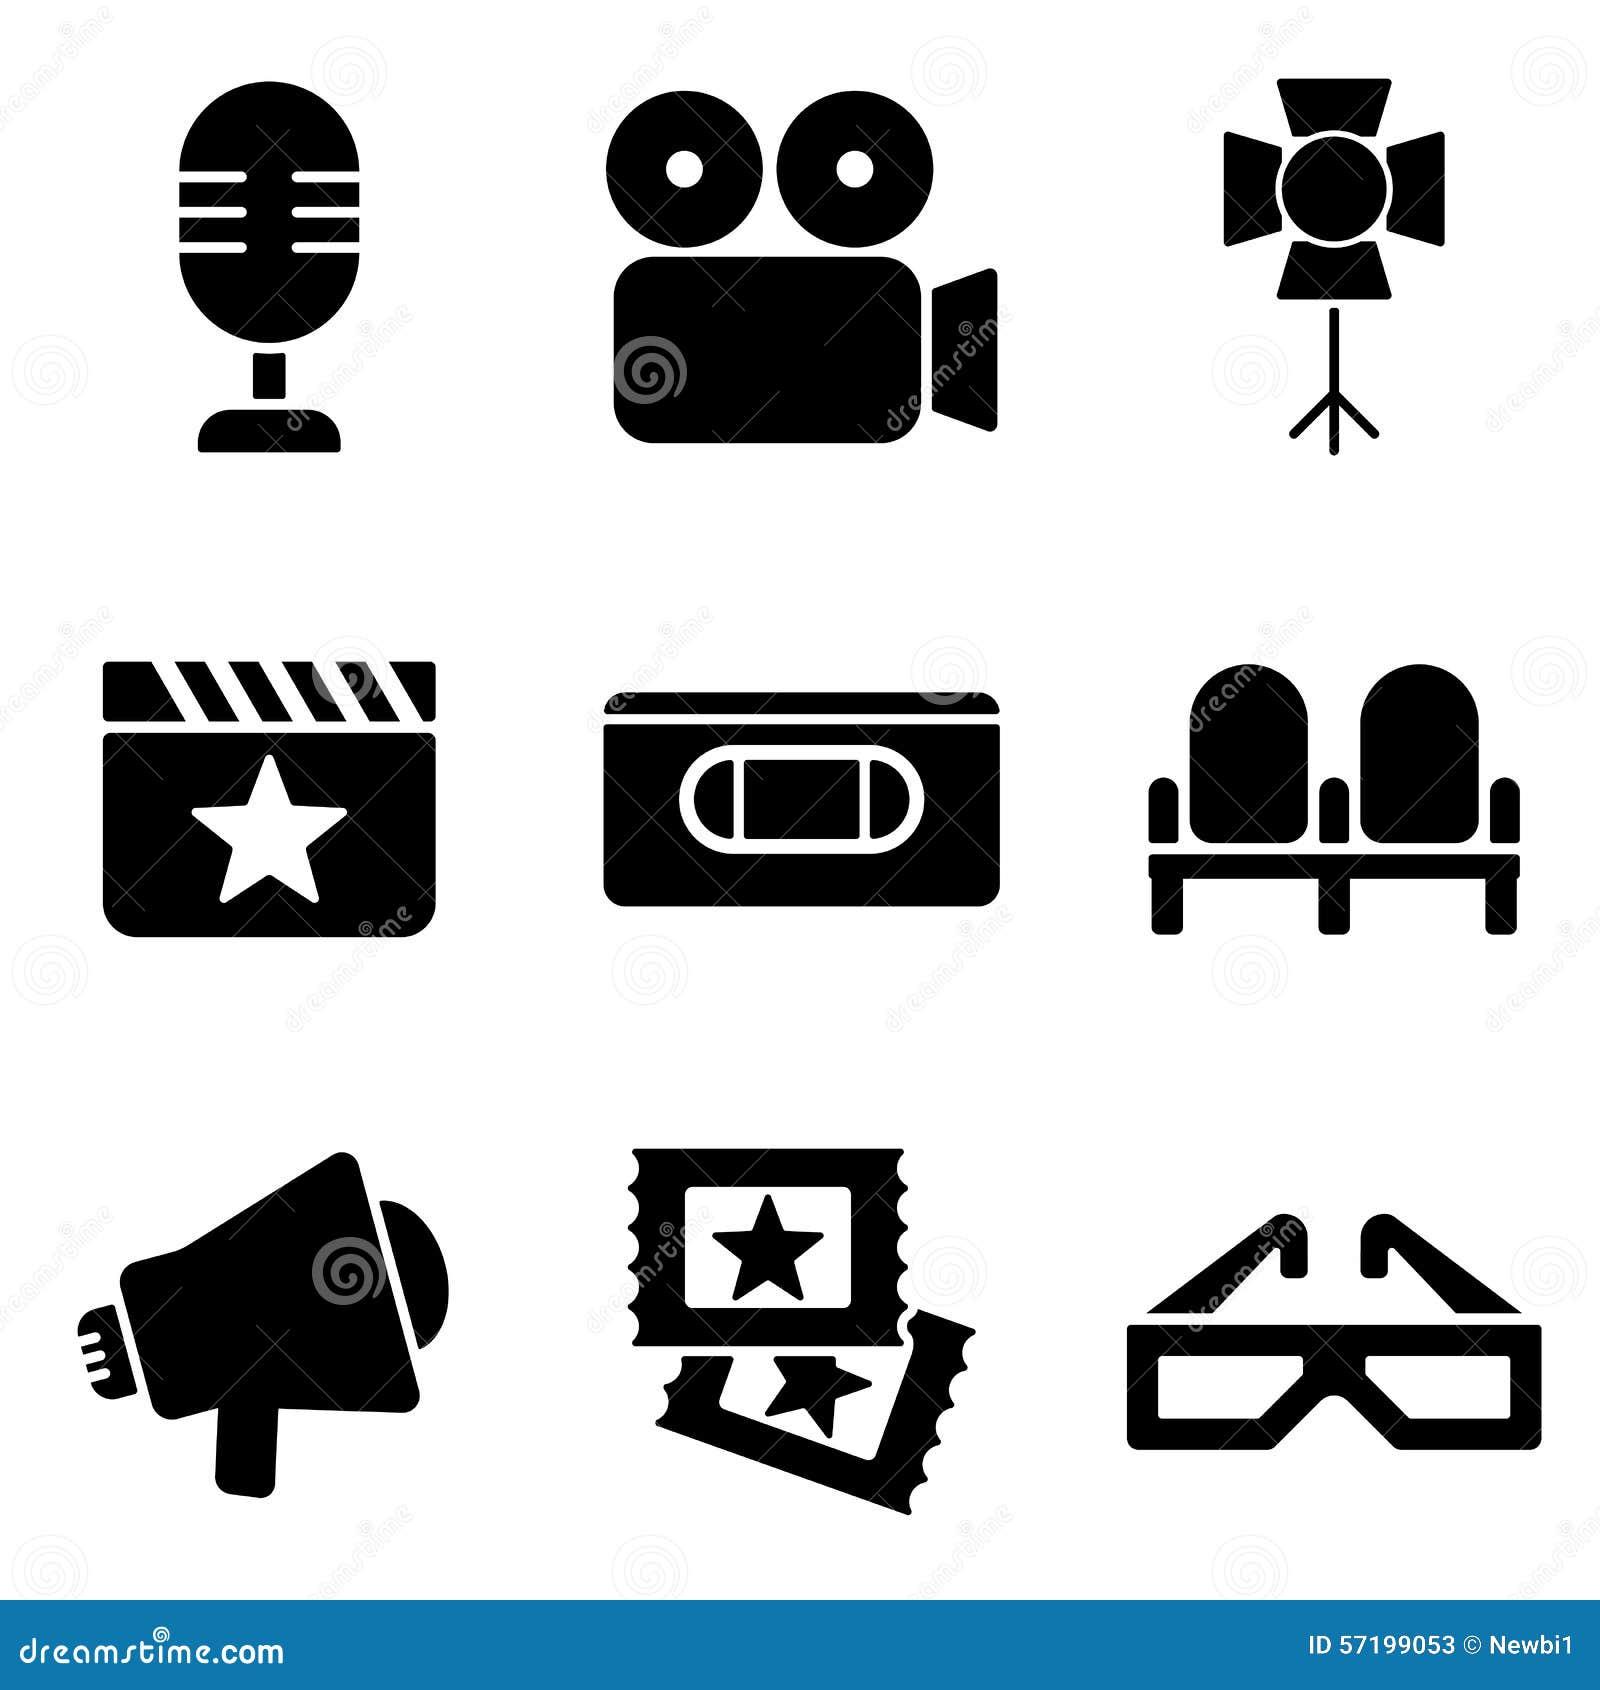 Cinema web and mobile logo icons collection stock vector cinema web and mobile logo icons collection stock photos buycottarizona Choice Image